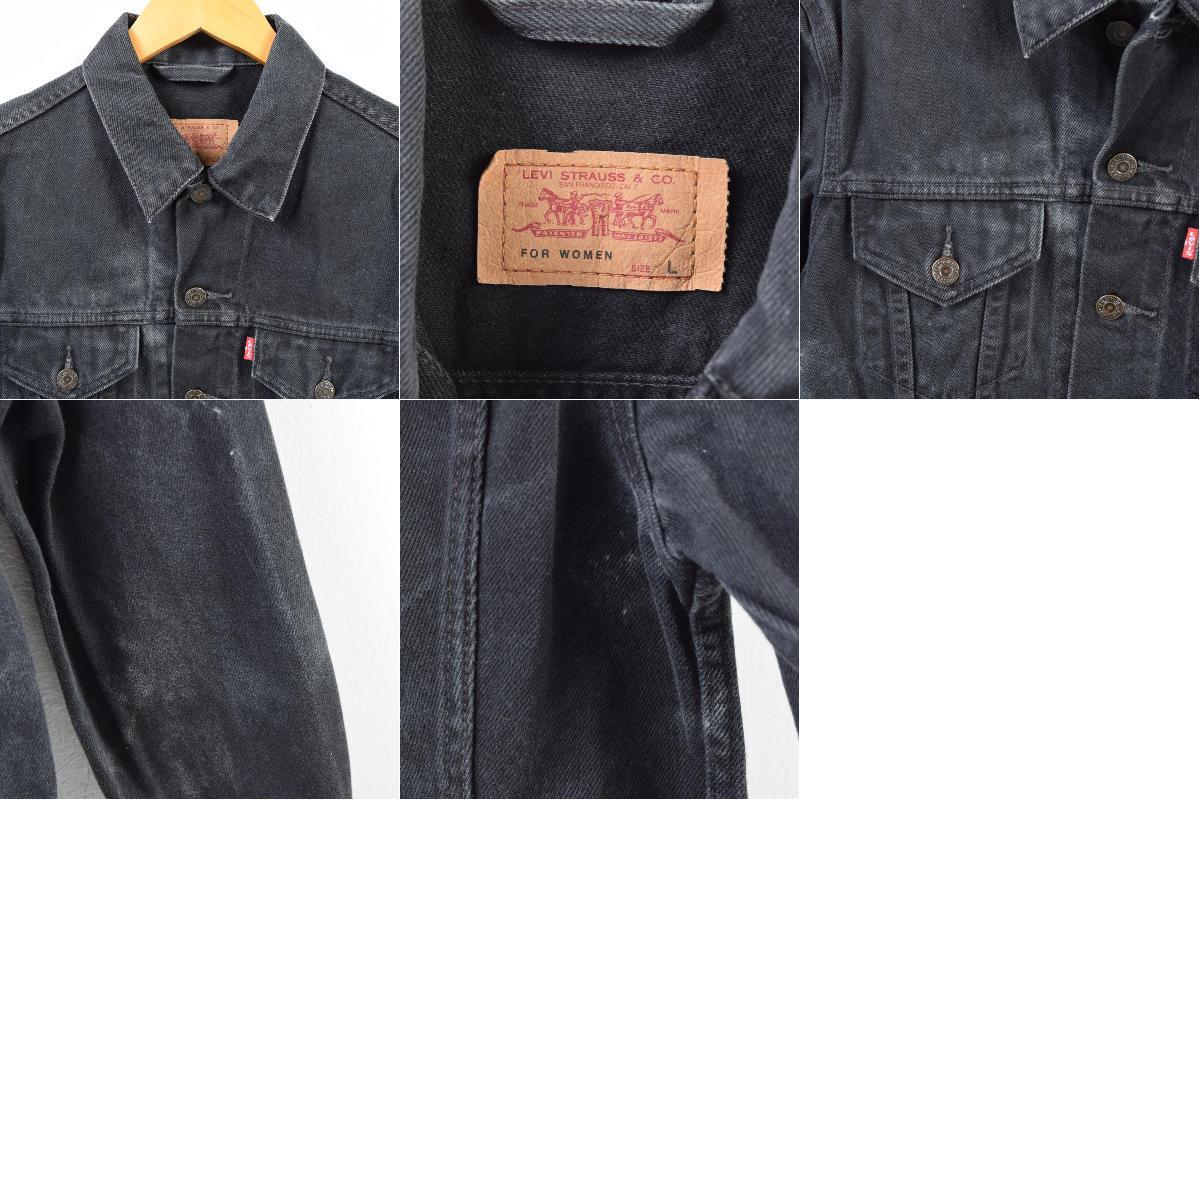 456a7dd132a6 ... 90s Levis Levi's FOR WOMEN black denim jacket G Jean Lady's L /wba5118